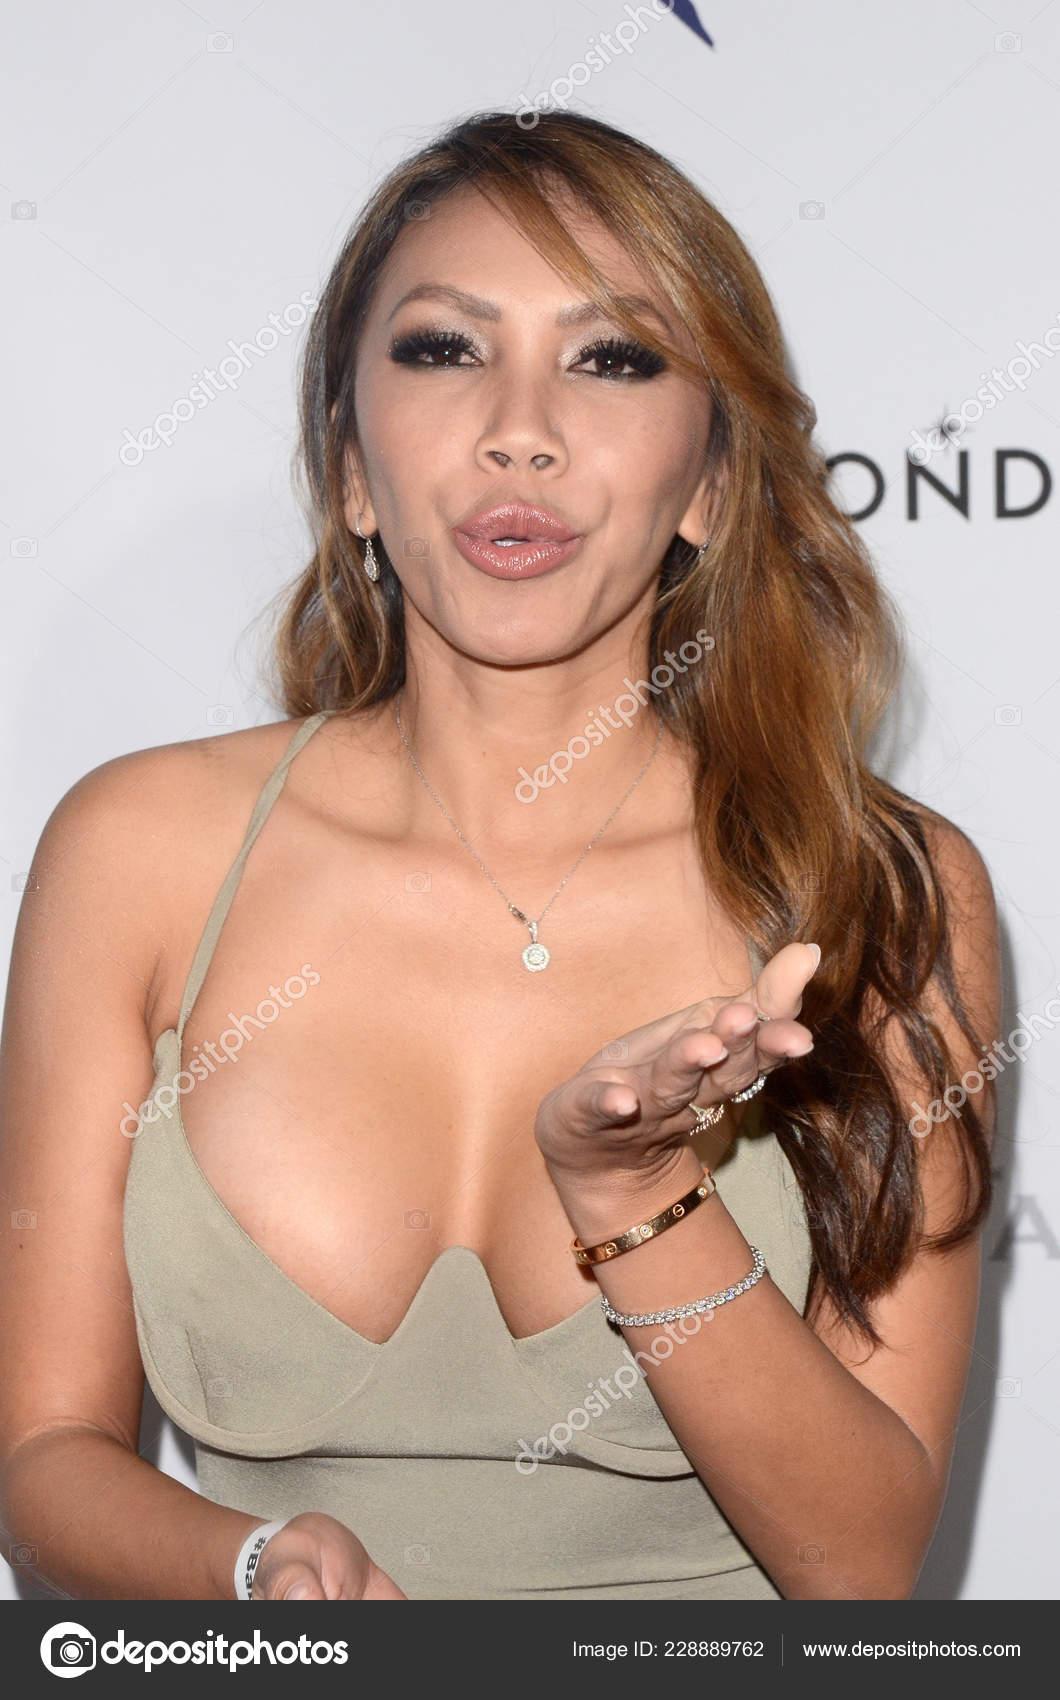 Celebrites Caya Hefner nudes (42 photos), Tits, Paparazzi, Feet, panties 2020